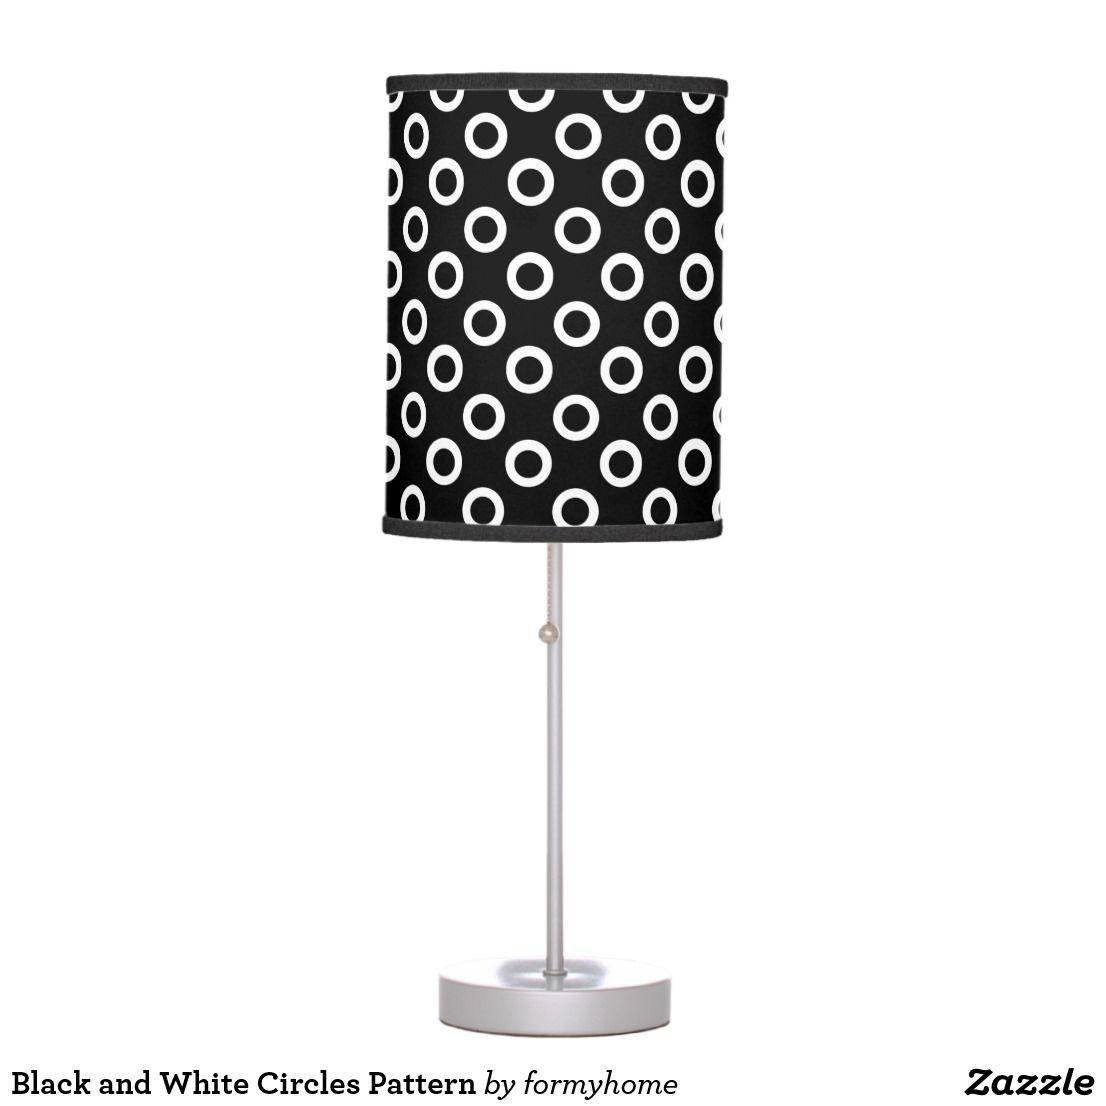 Black and White Circles Pattern Desk Lamp lamp